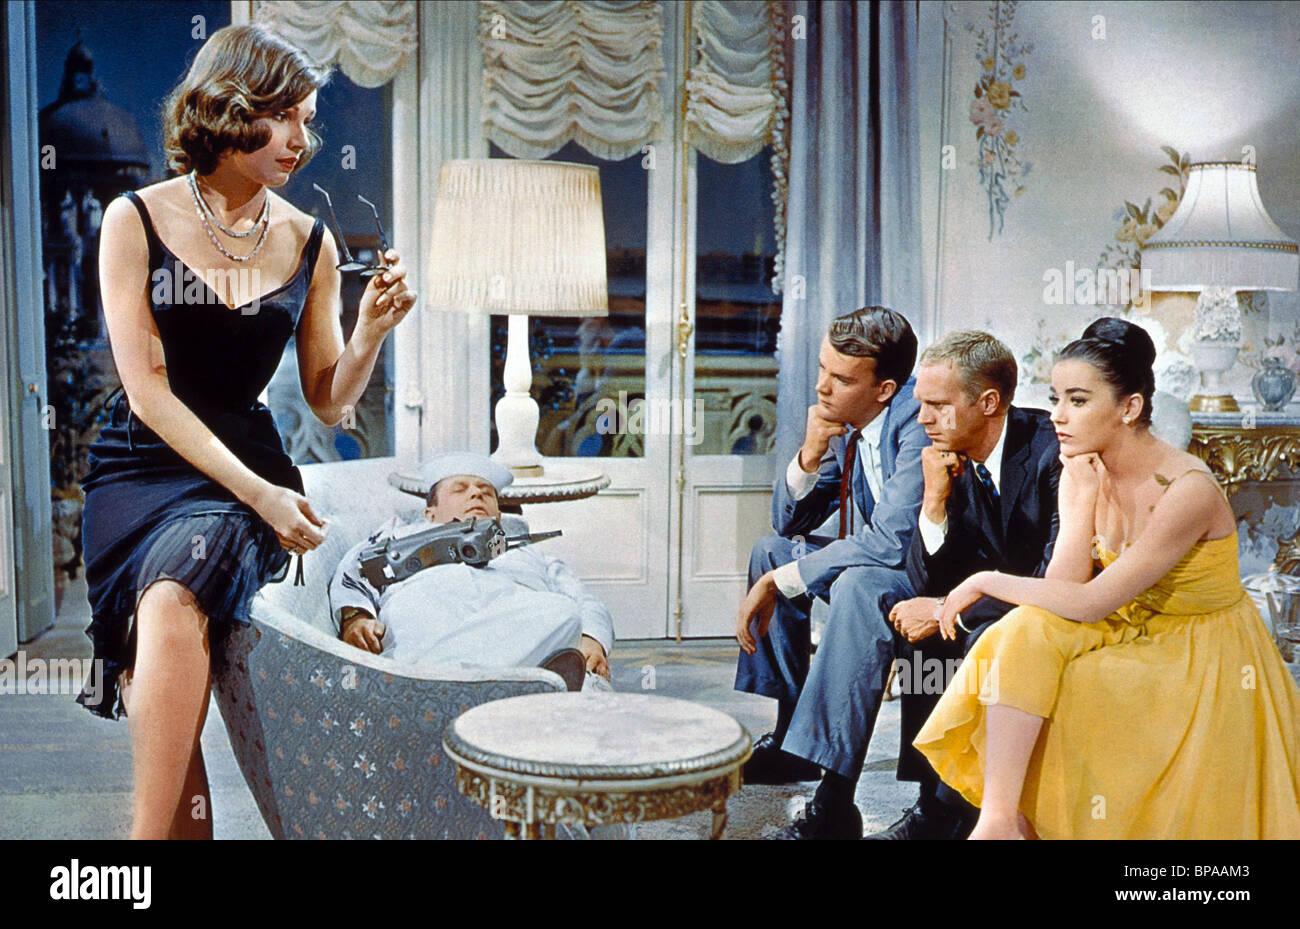 Ciara Sotto (b. 1980),Suzan Farmer Hot pics & movies Rita Rio (1914?989),Anne Hathaway